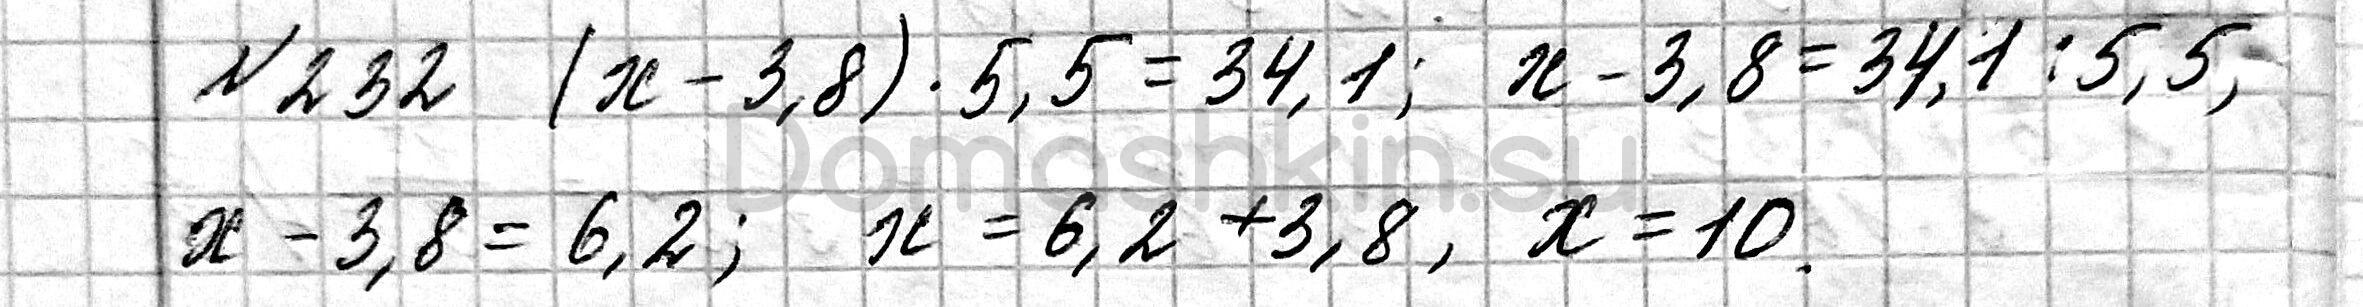 Математика 6 класс учебник Мерзляк номер 232 решение